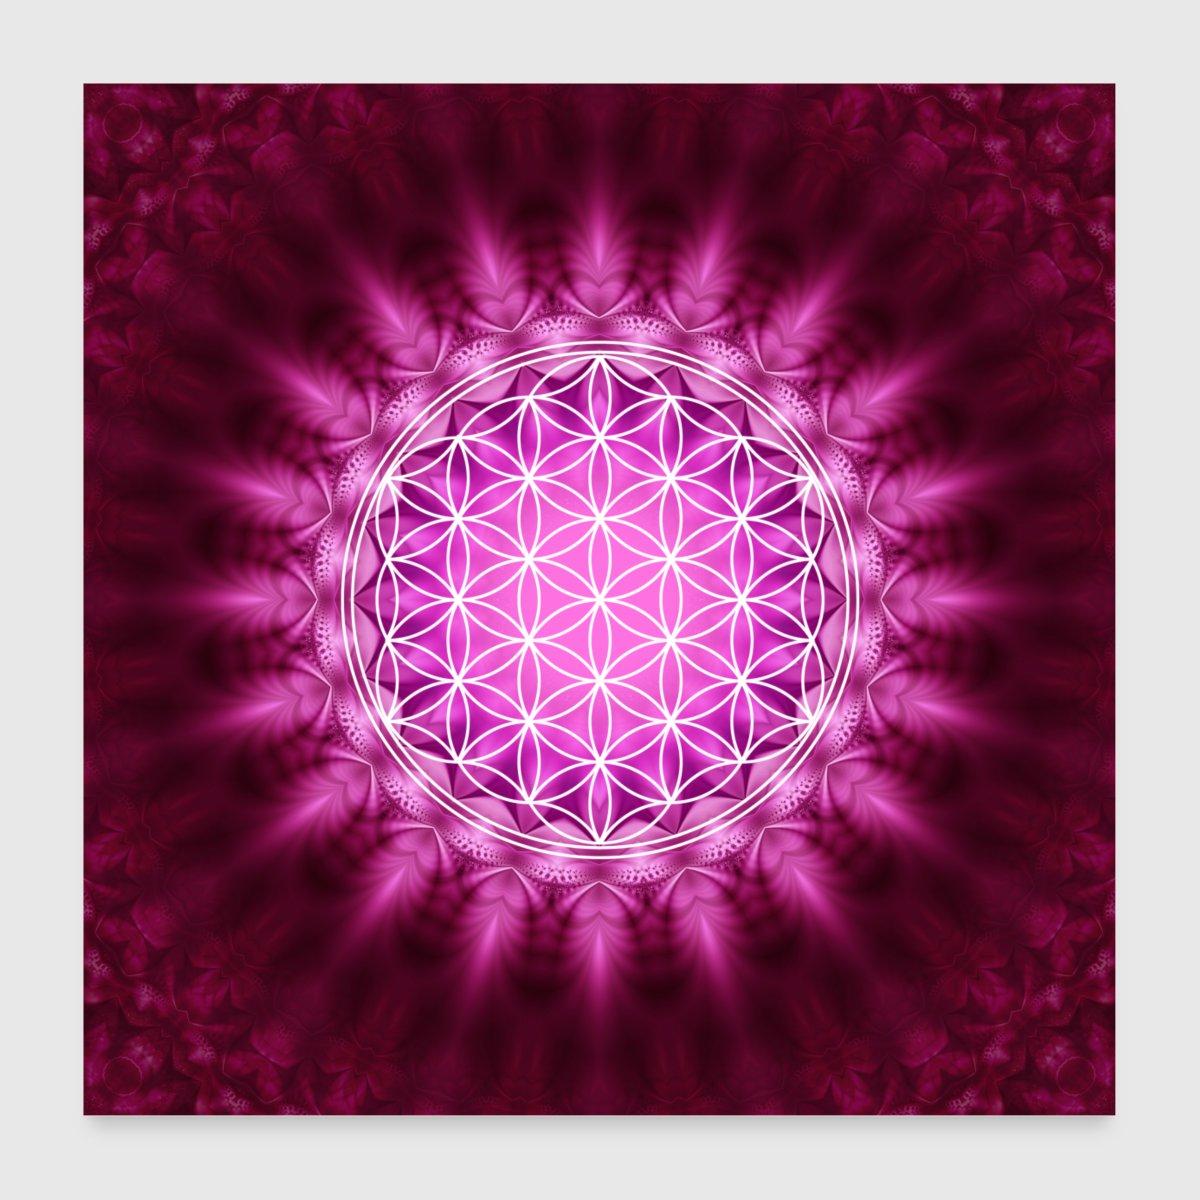 Flower Of Life Yoga Meditation Lotus Mandala By By Yuma Spreadshirt